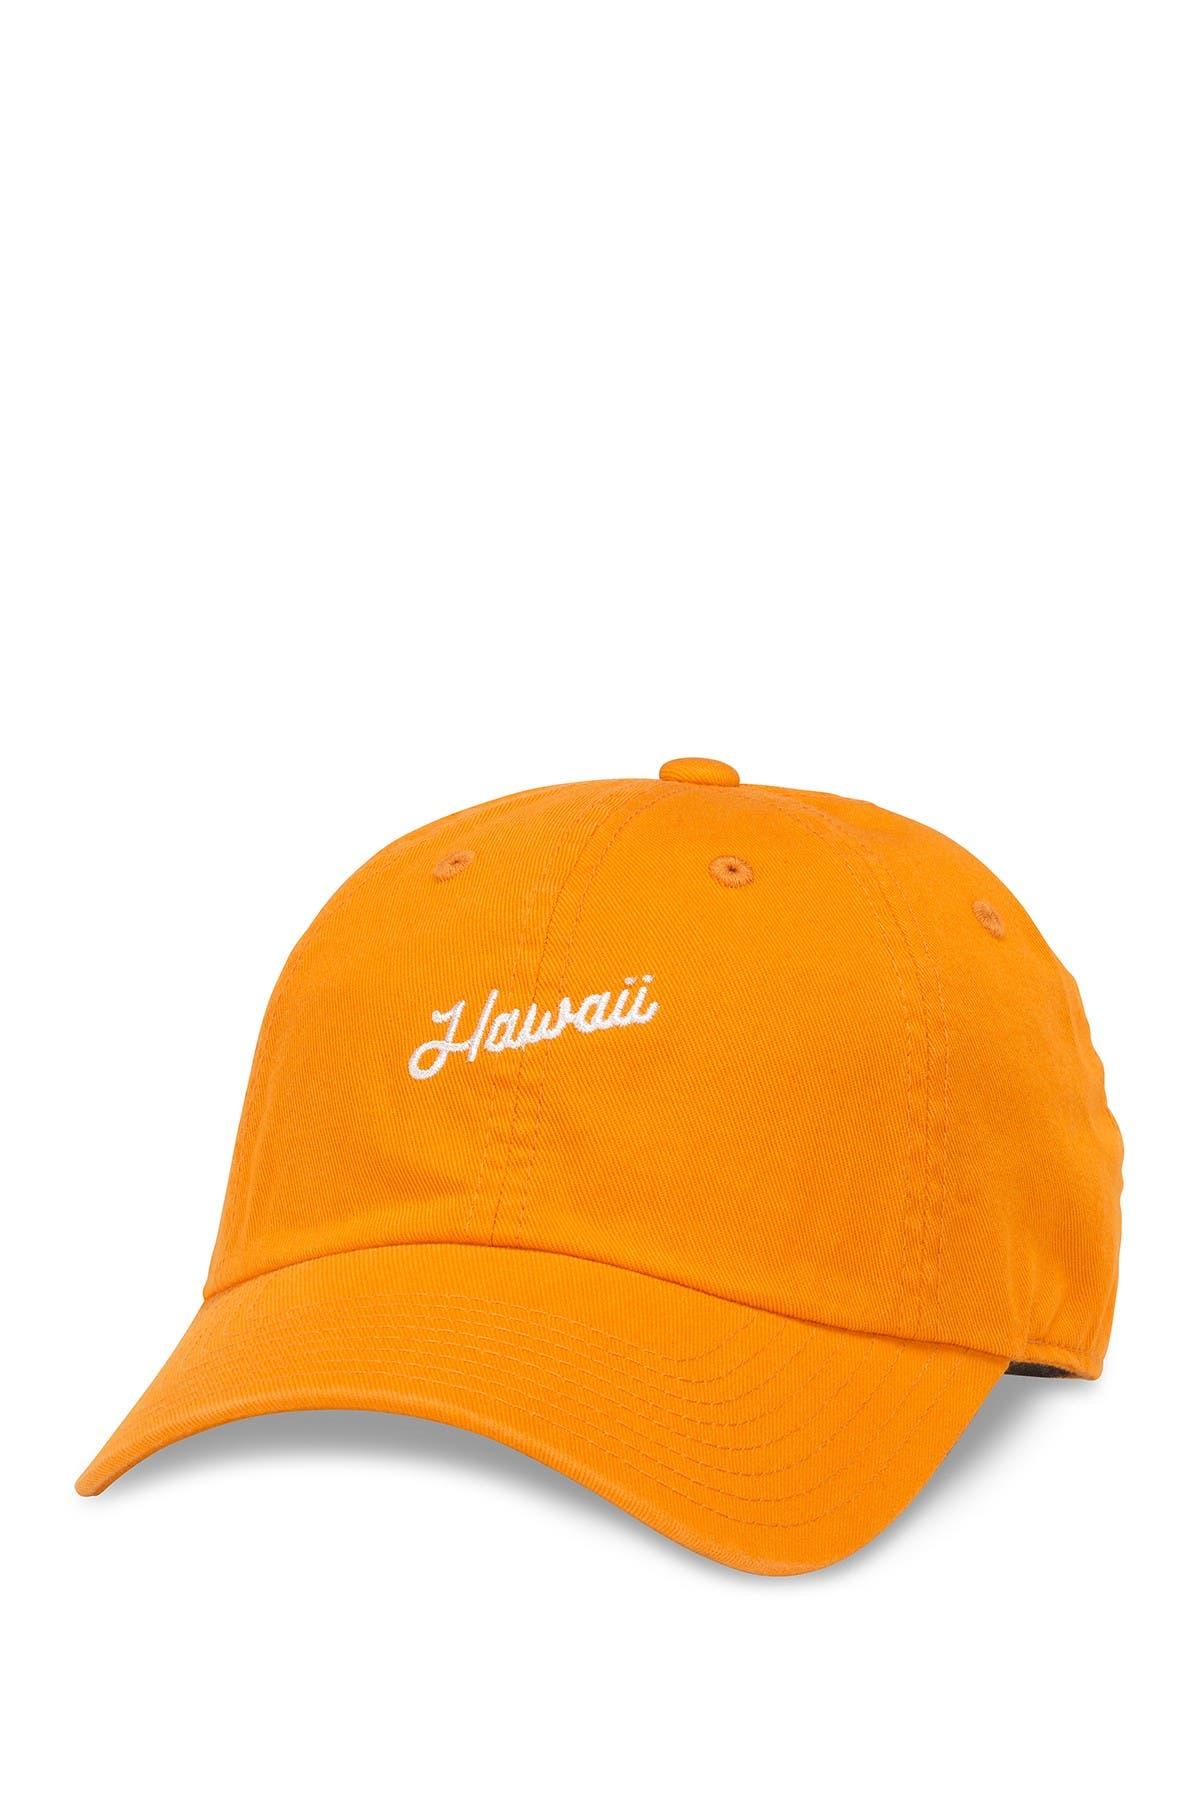 Image of American Needle Hawaii Embroidered Baseball Cap